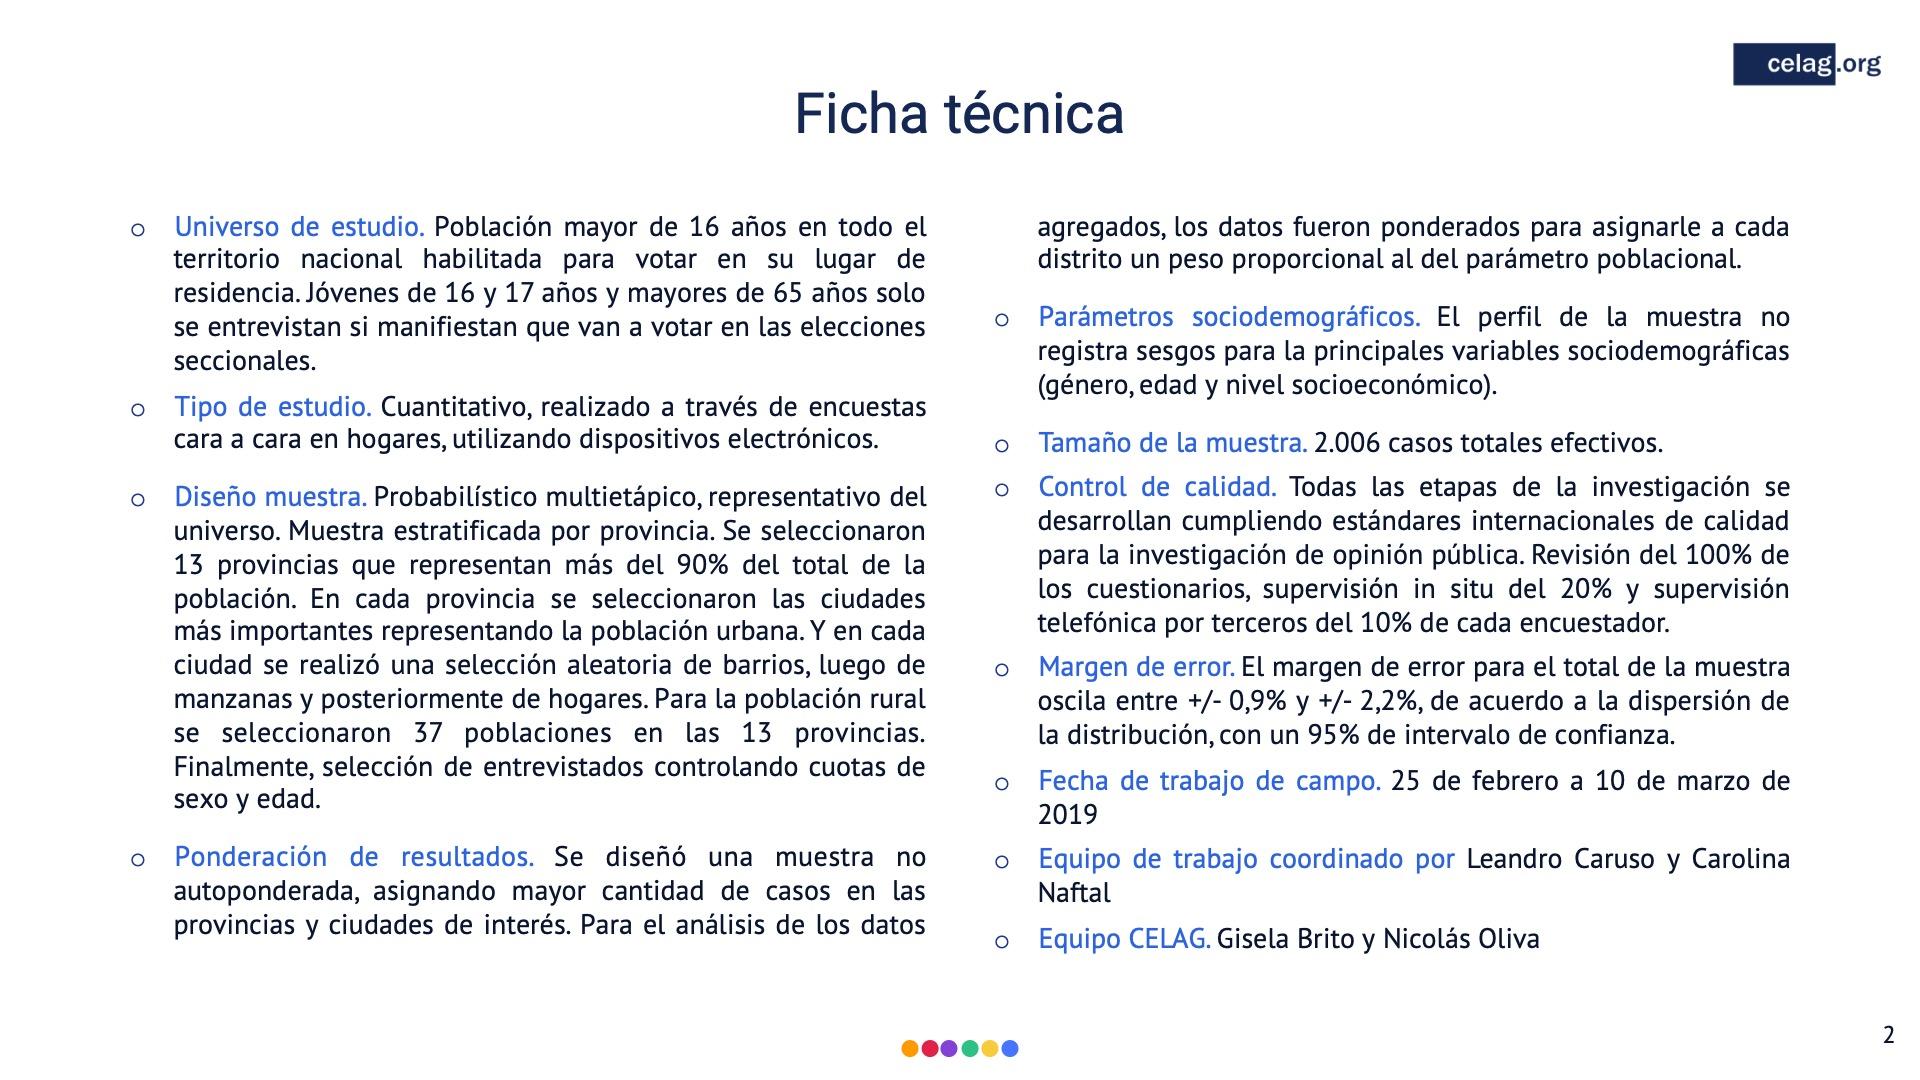 02 Ficha tecnica encuesta ecuador